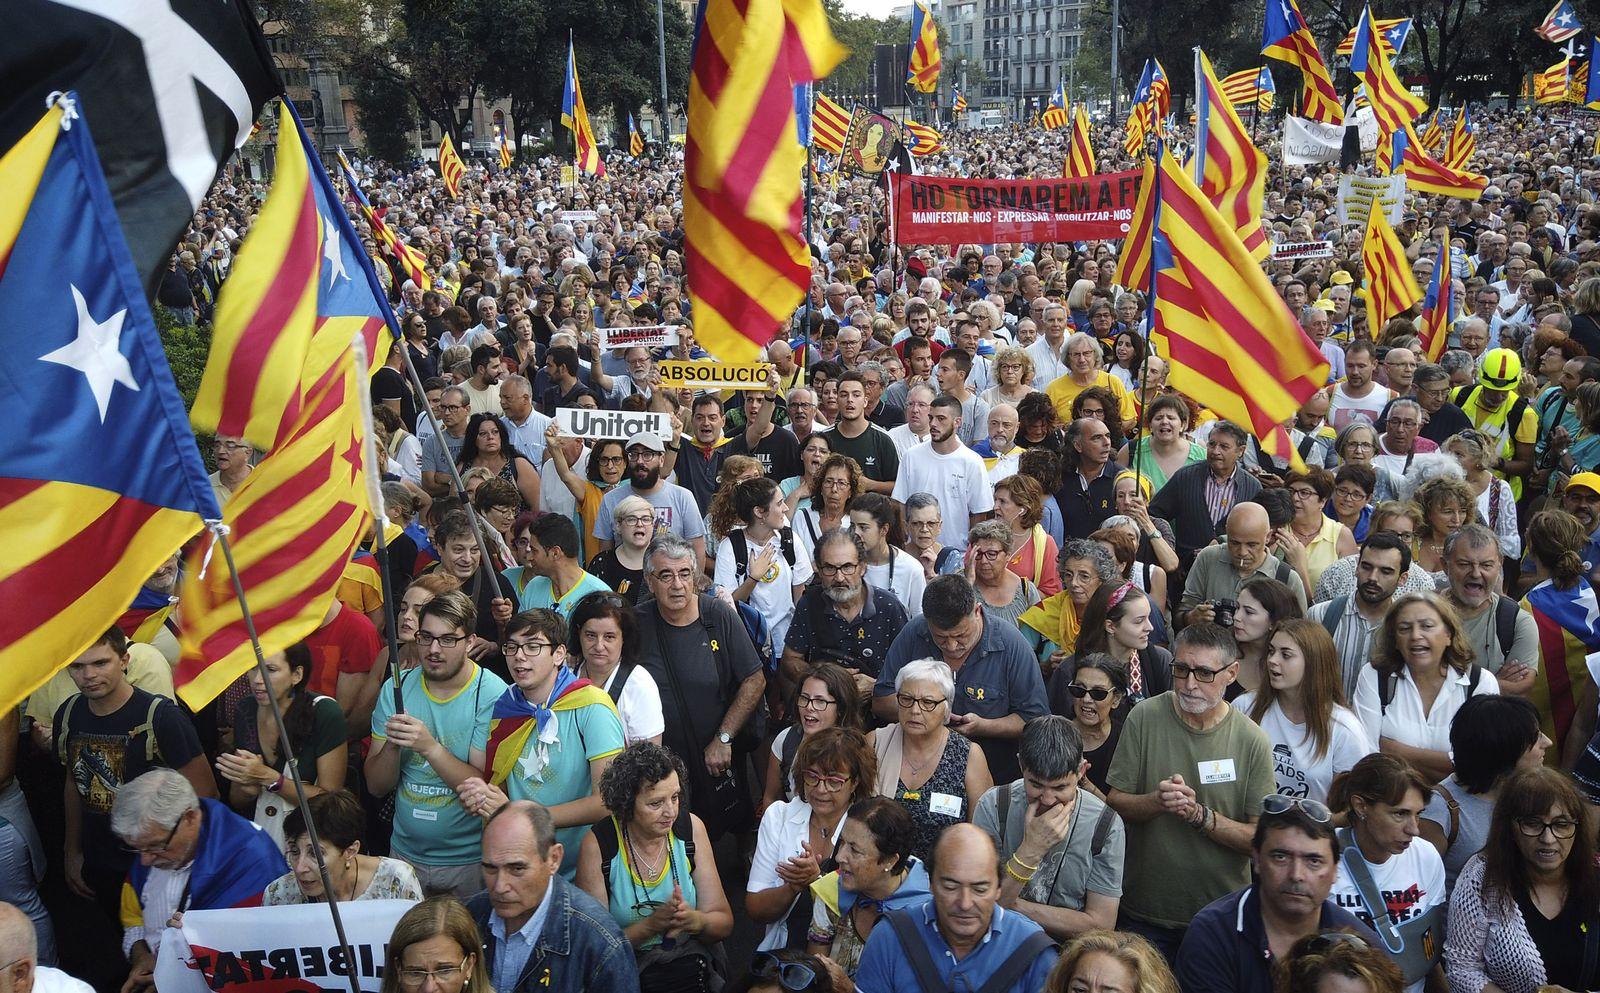 Kundgebung von Separatisten in Barcelona